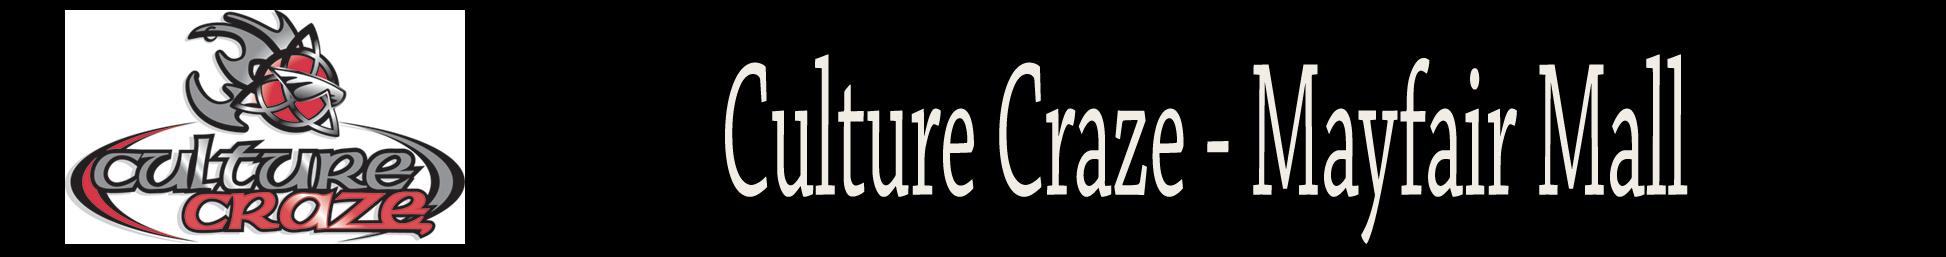 CultureCraze